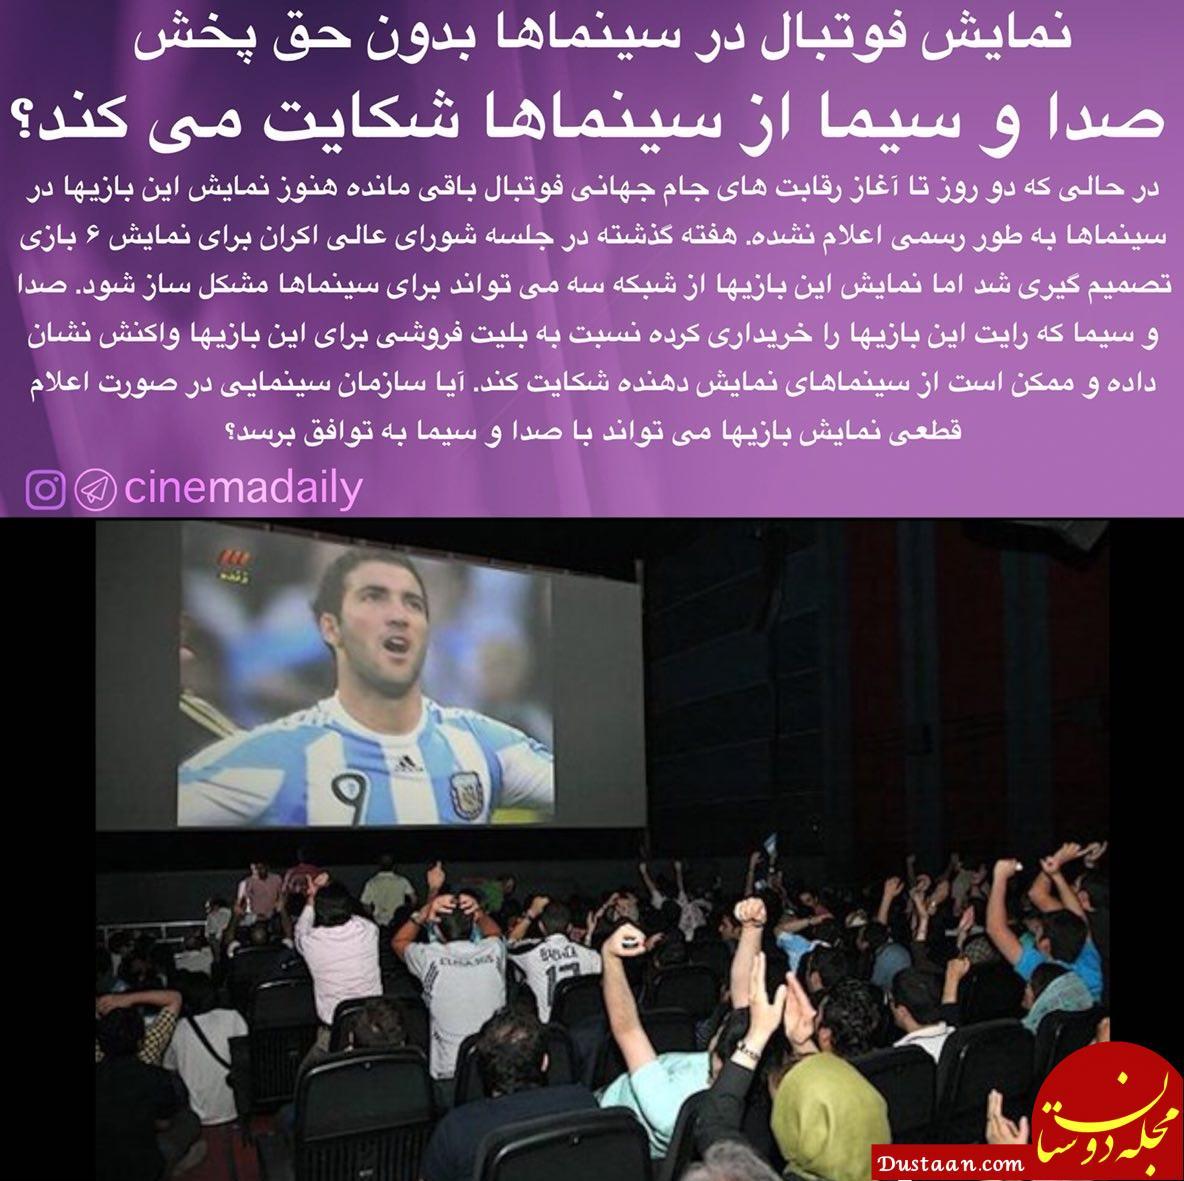 www.dustaan.com شکایت صدا و سیما از سینماها در صورت نمایش فوتبال؟